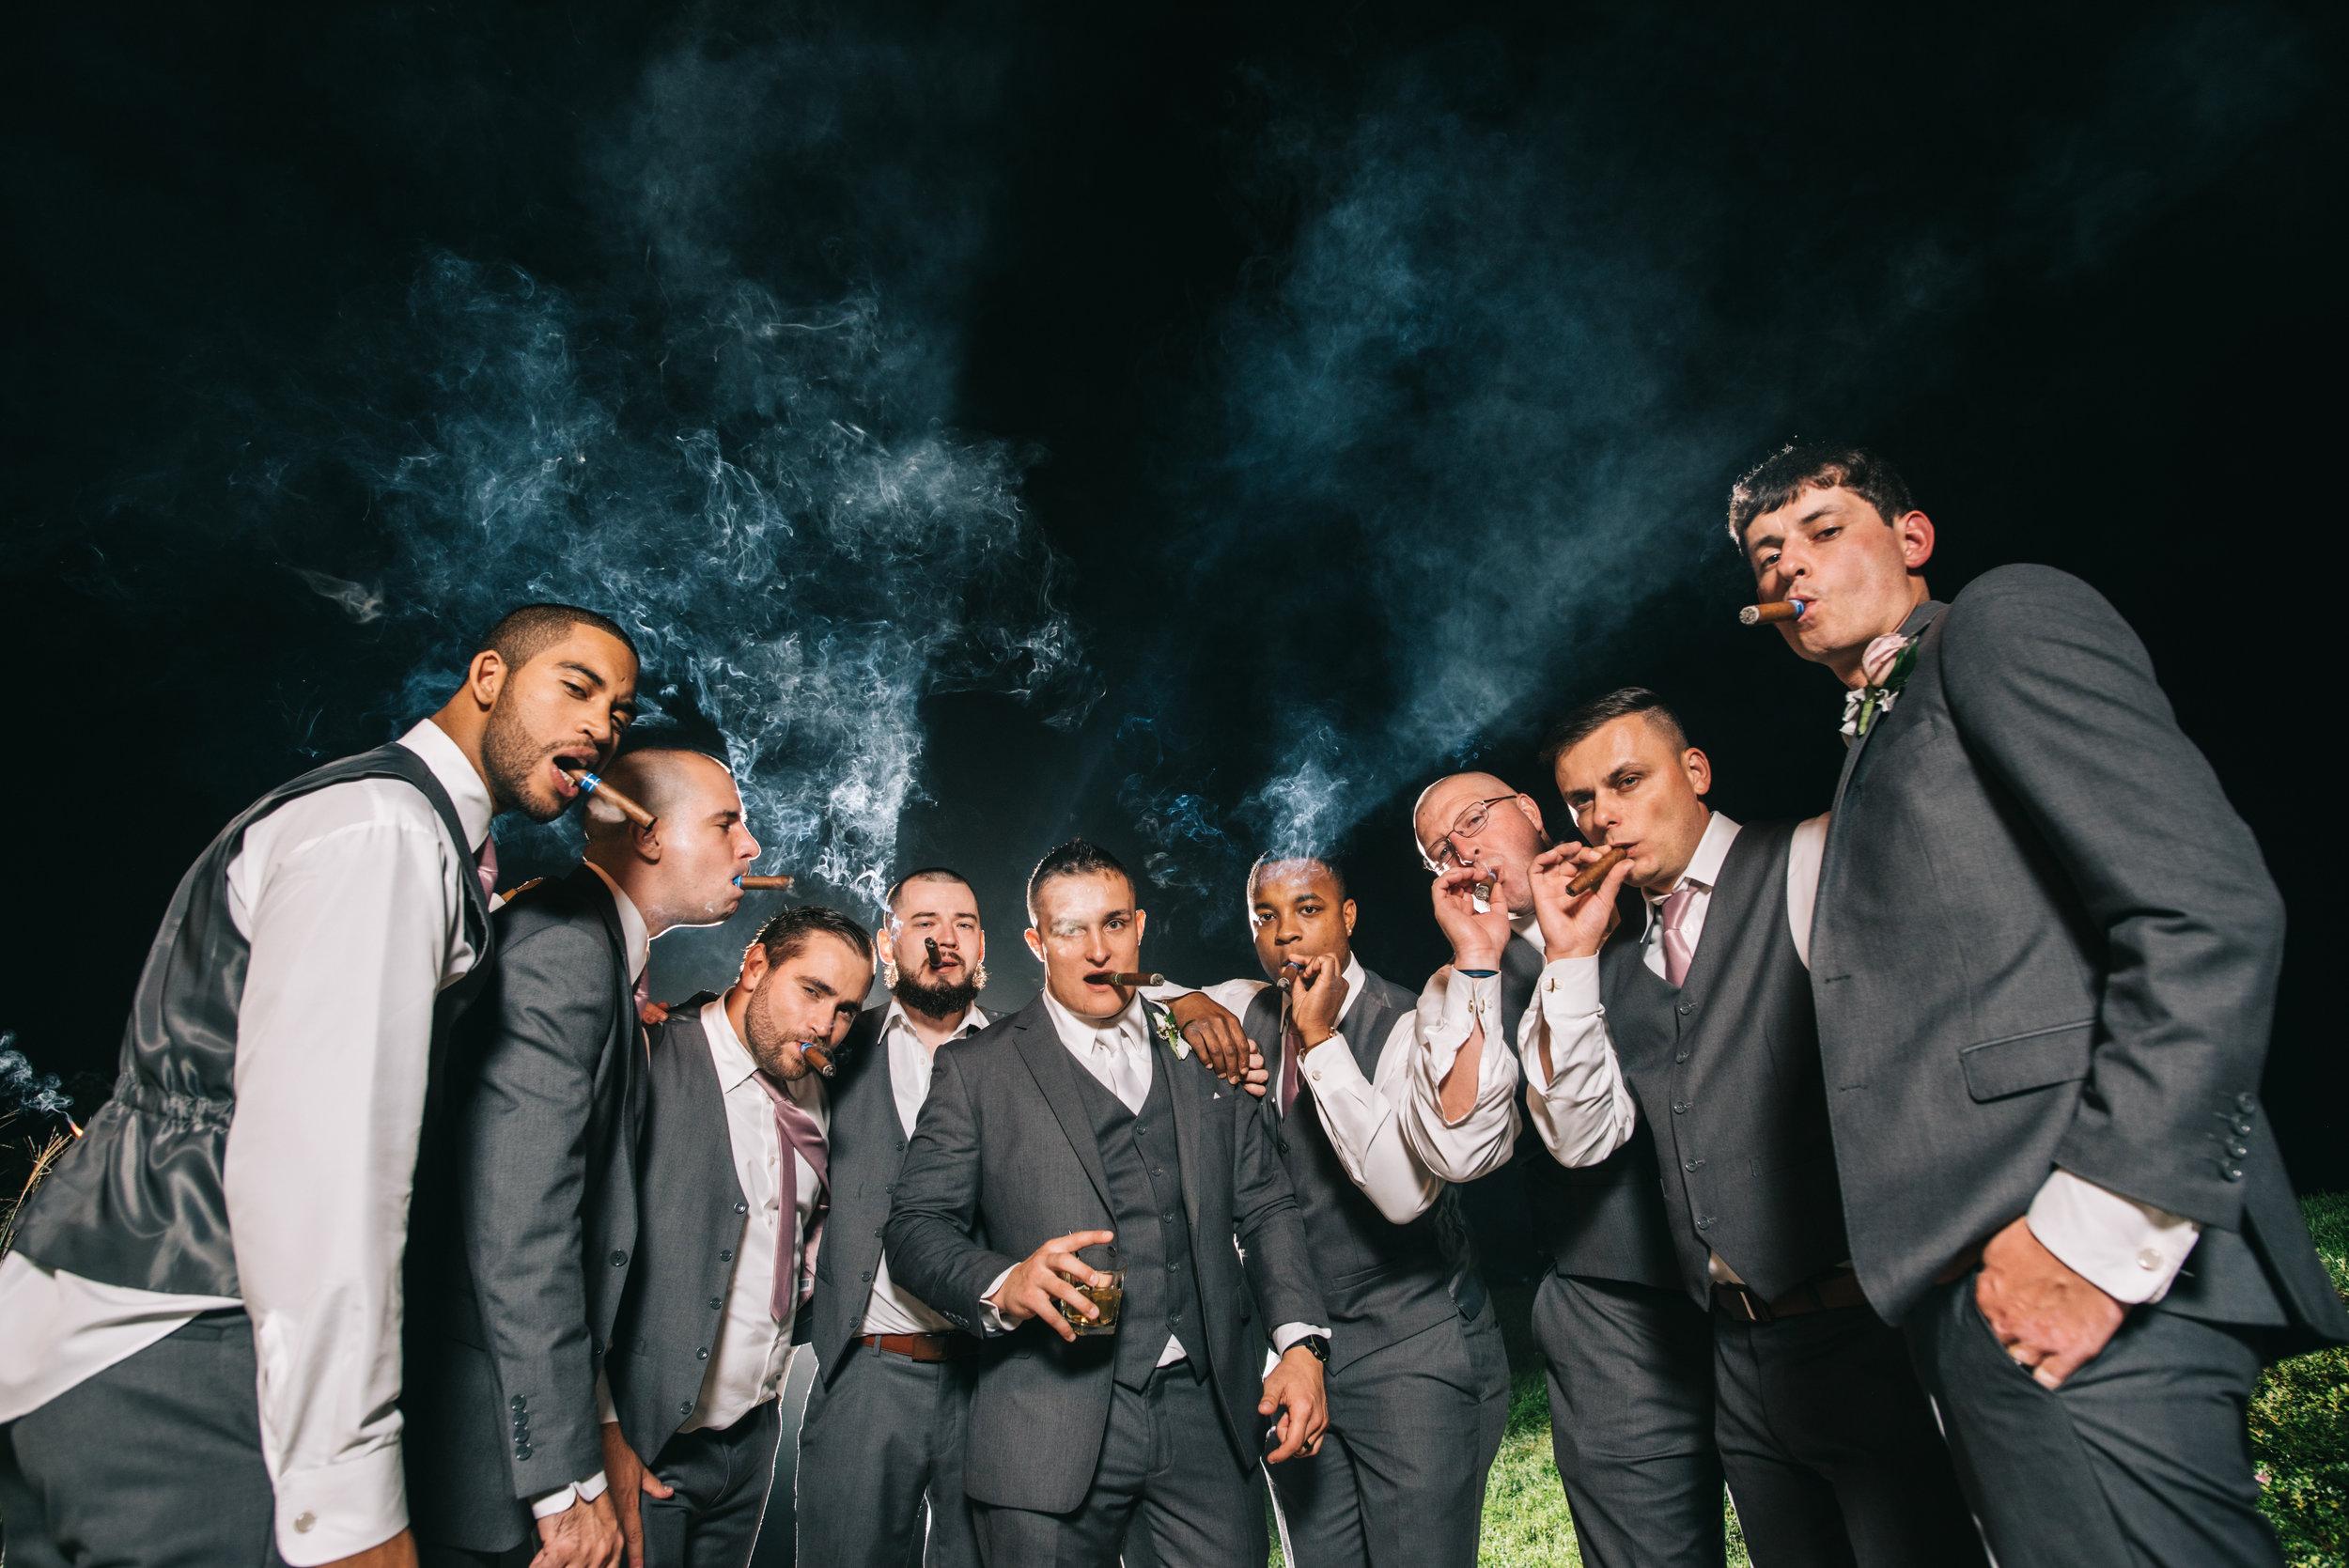 WeddingPhotos | NJPhotographer | Highlights-19.jpg